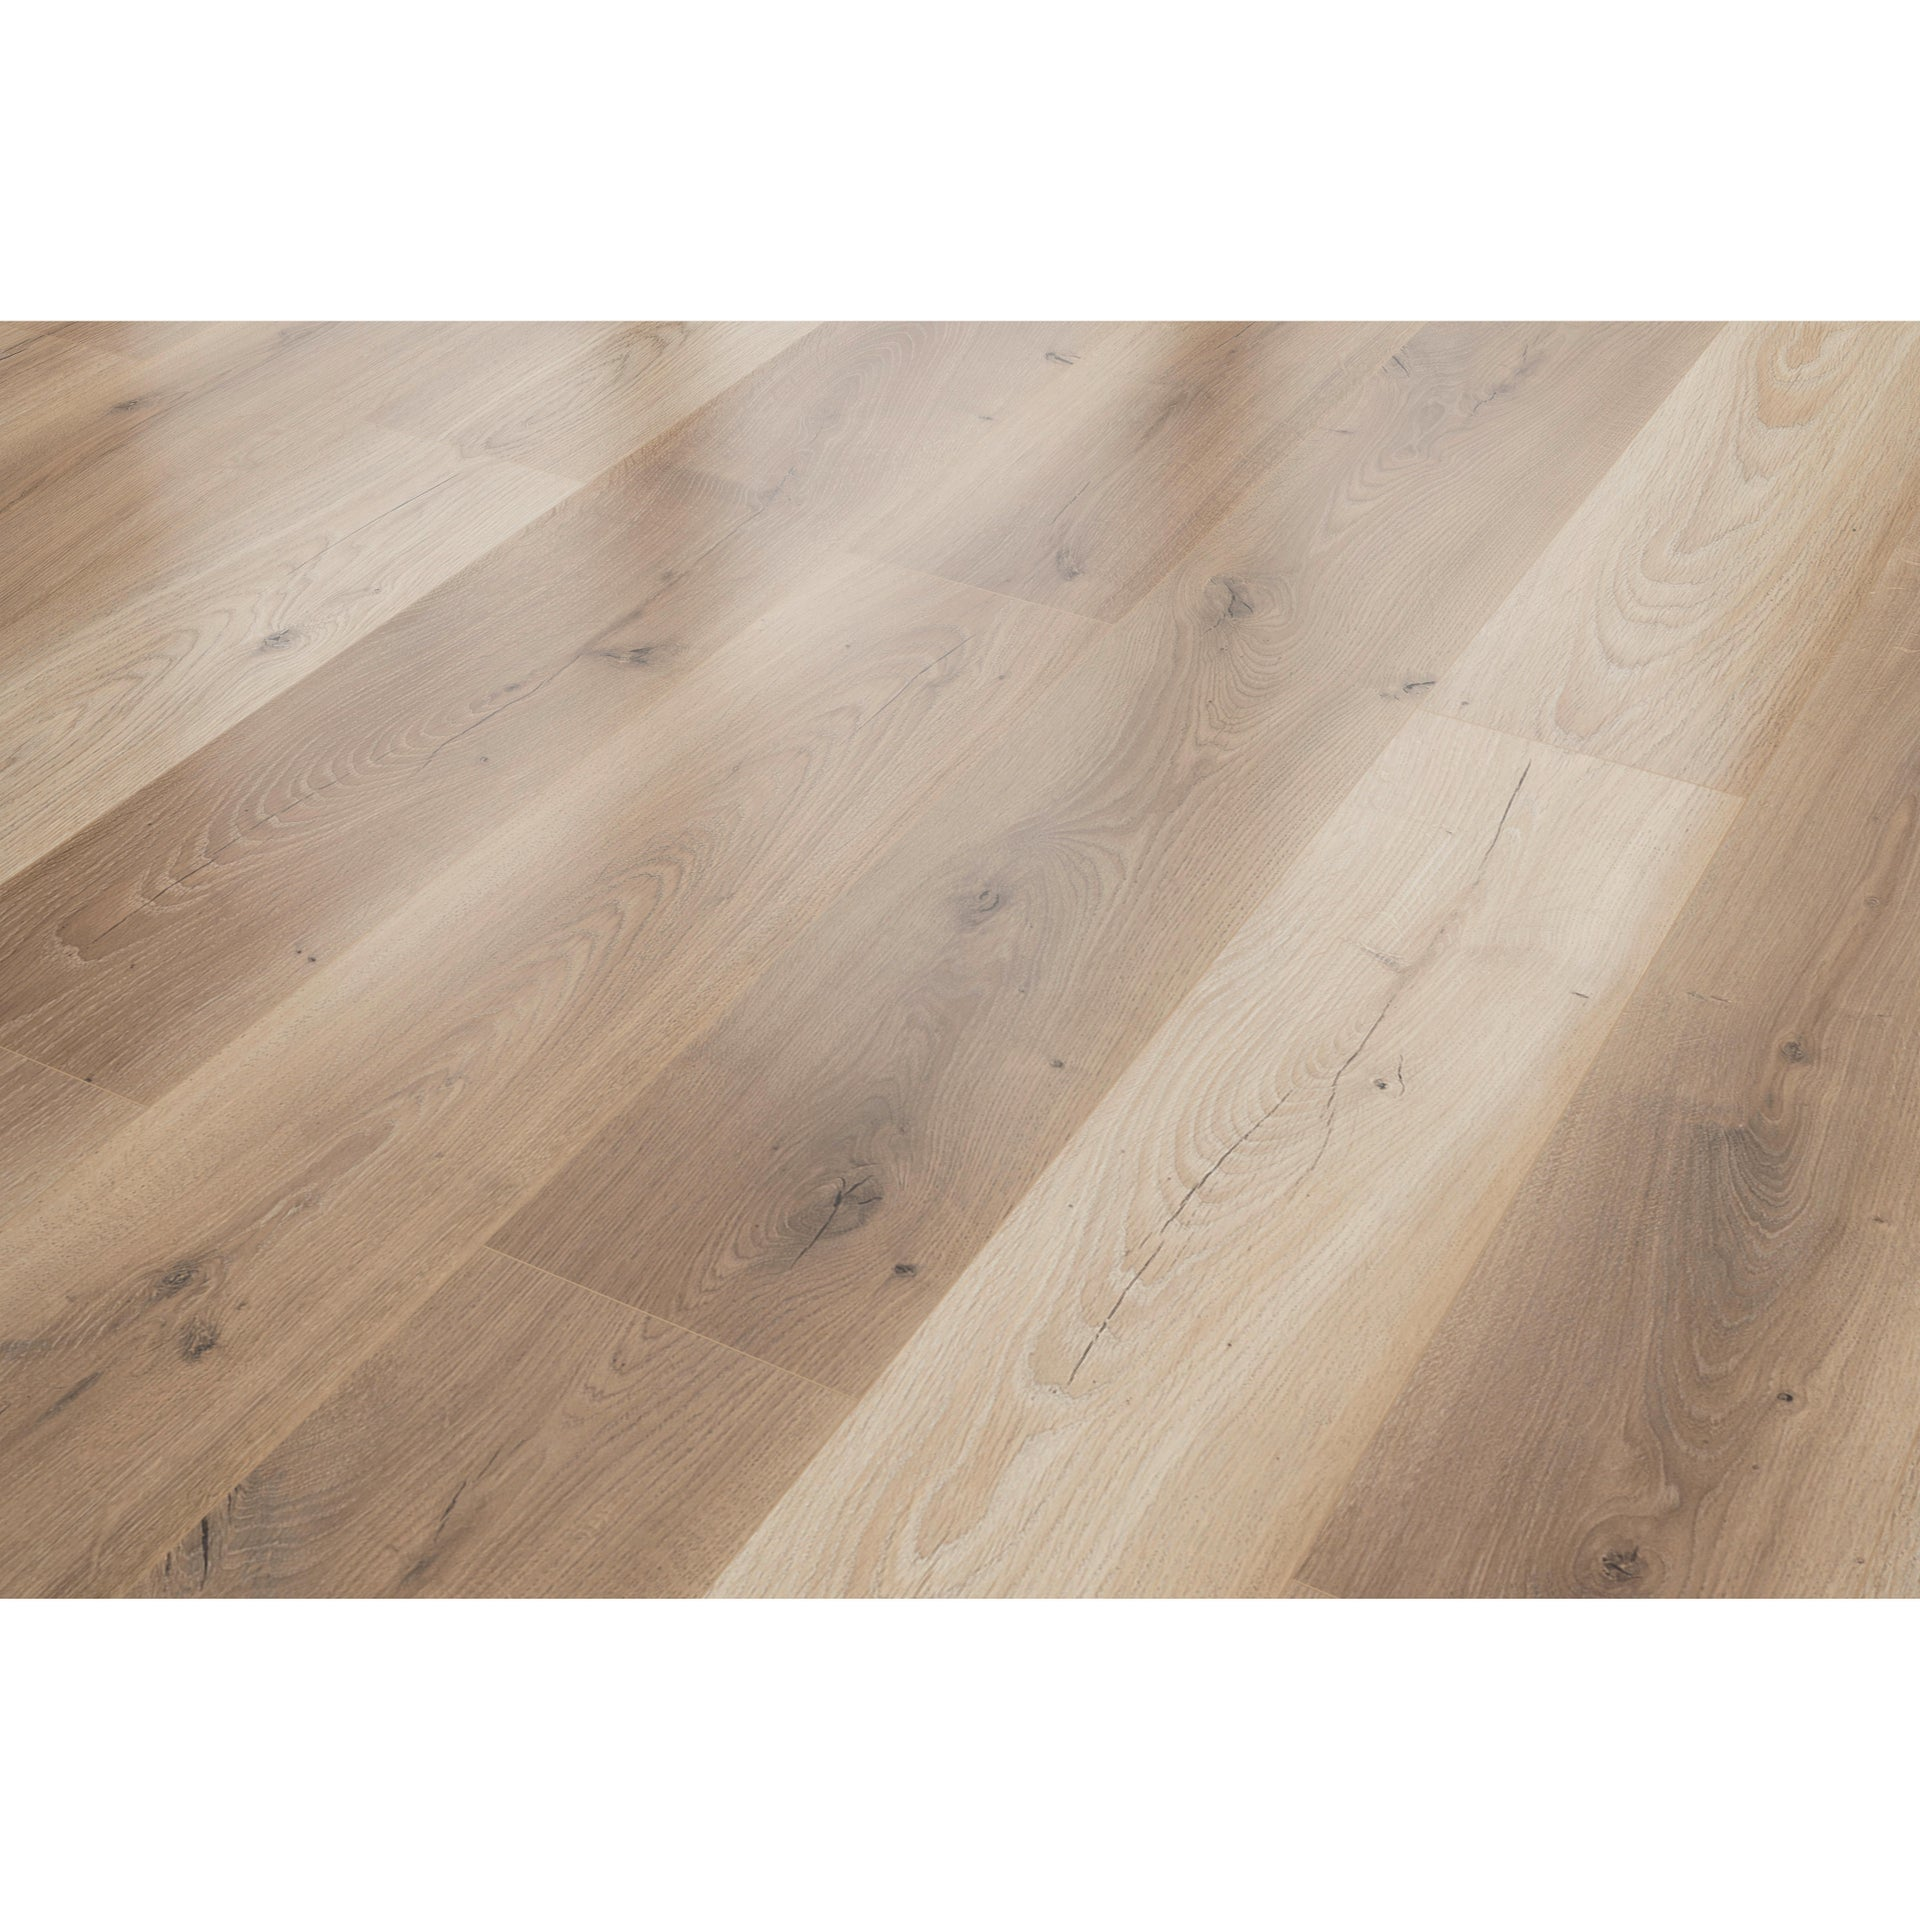 Pavimento laminato H2O Oak Sp 8 mm grigio / argento - 5